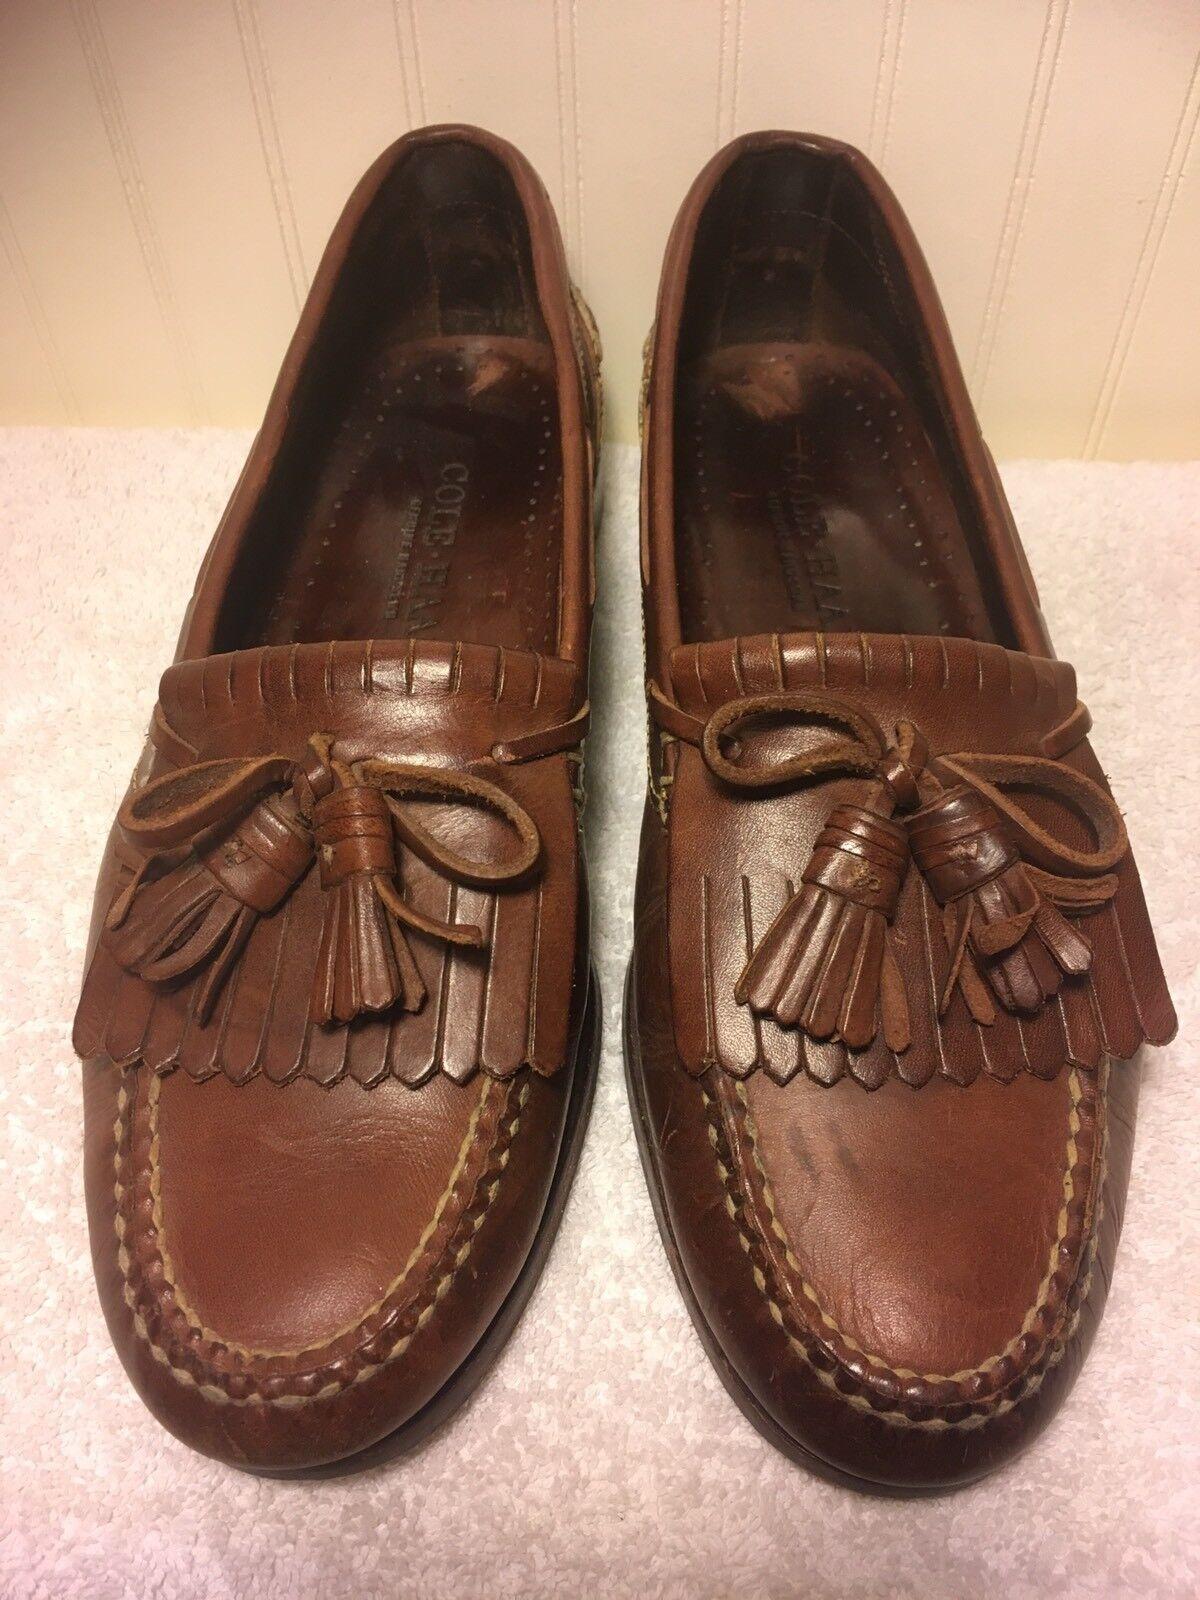 Cole Haan Mens US 9.5 Brown Leather Slip On Loafer shoes Kiltie Tassel Handsewn